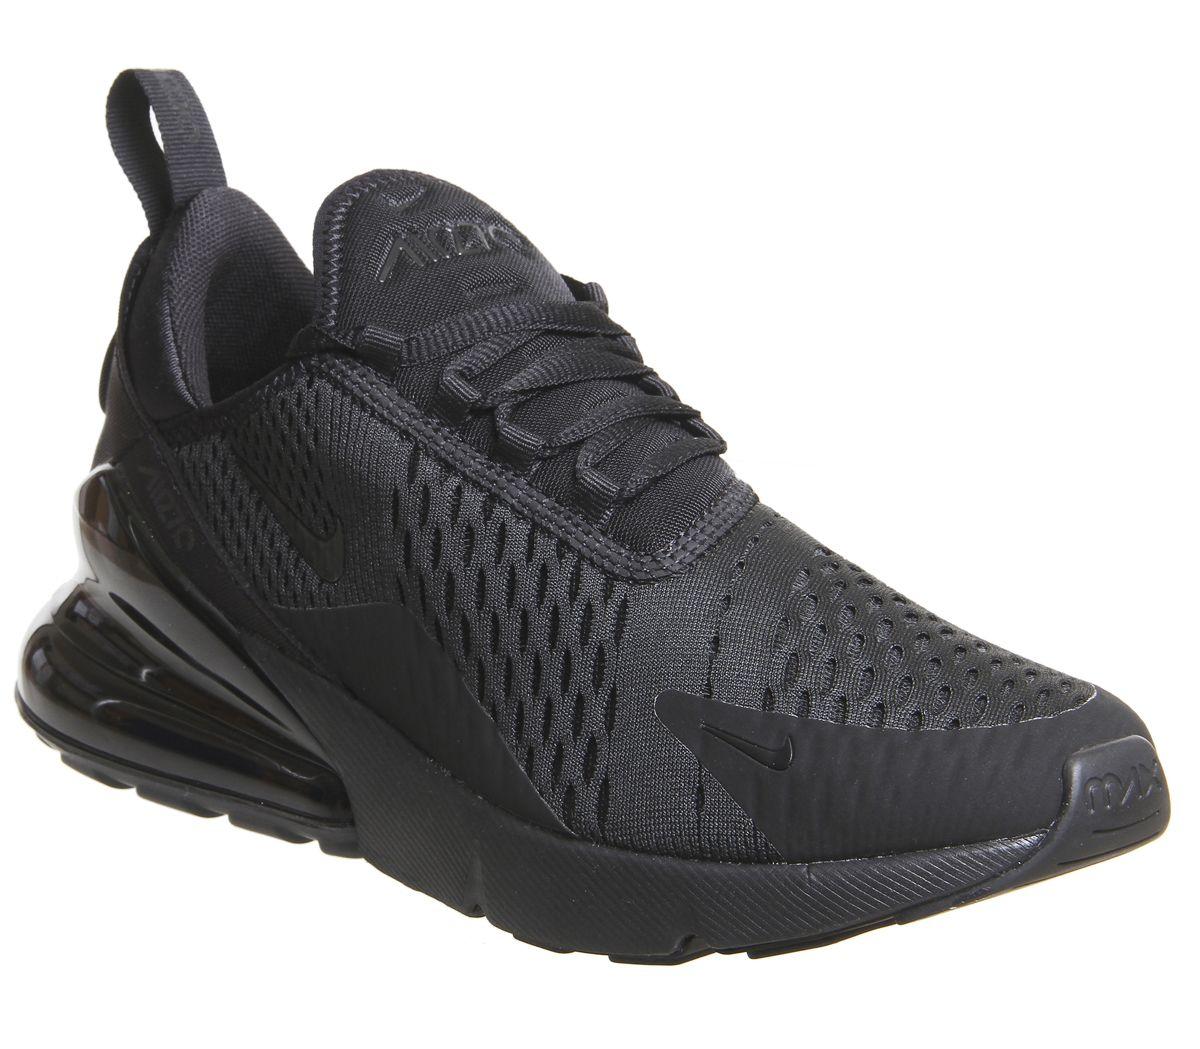 9a611ba87c Nike Air Max 270 Trainers Black Black F - Hers trainers